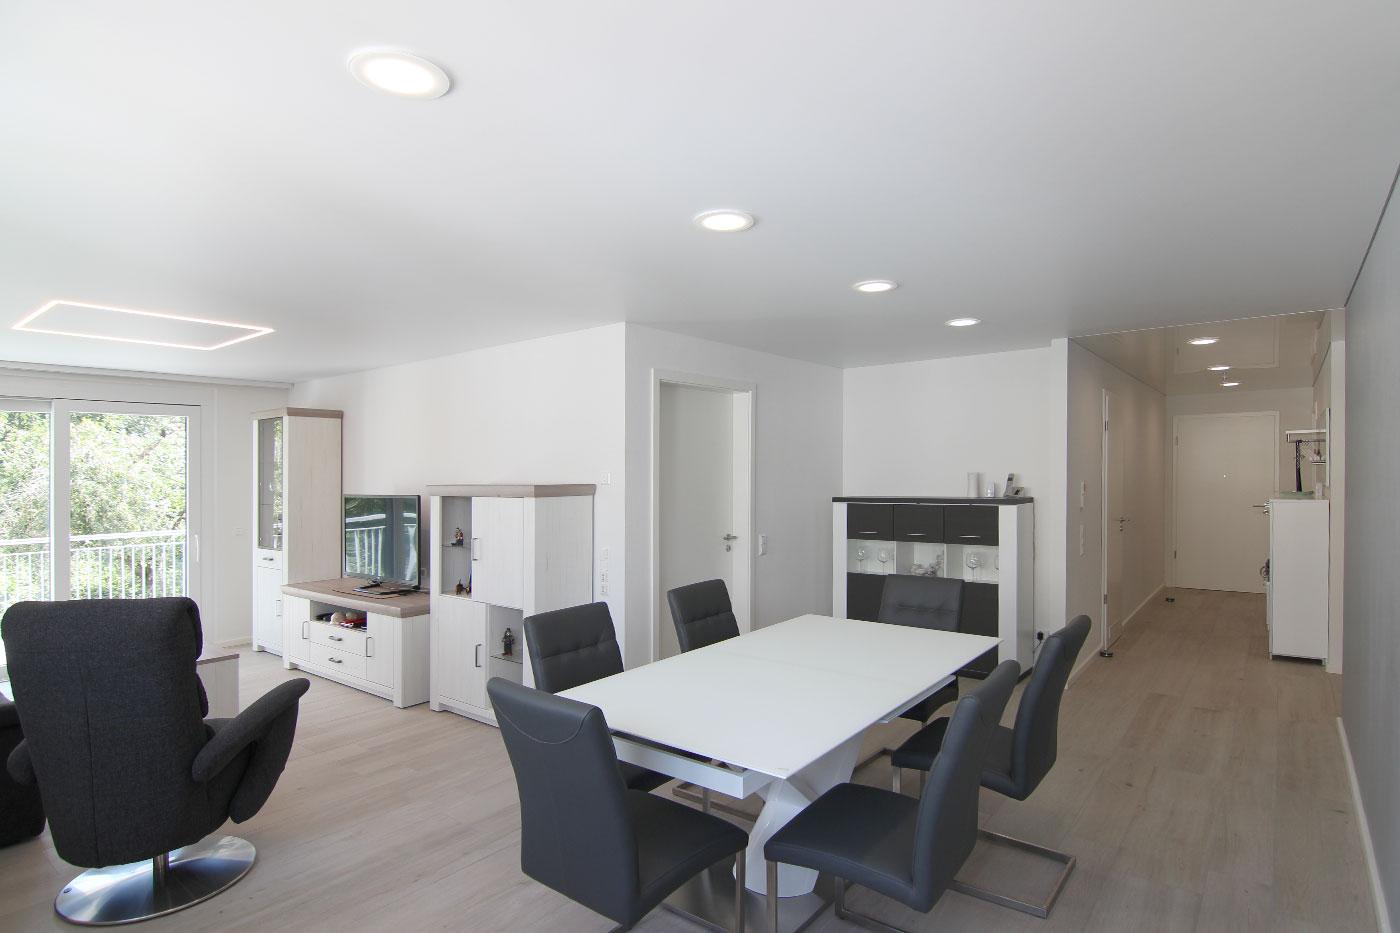 Spanndeckenstudio Teller - Beleuchtung - LED-Panels